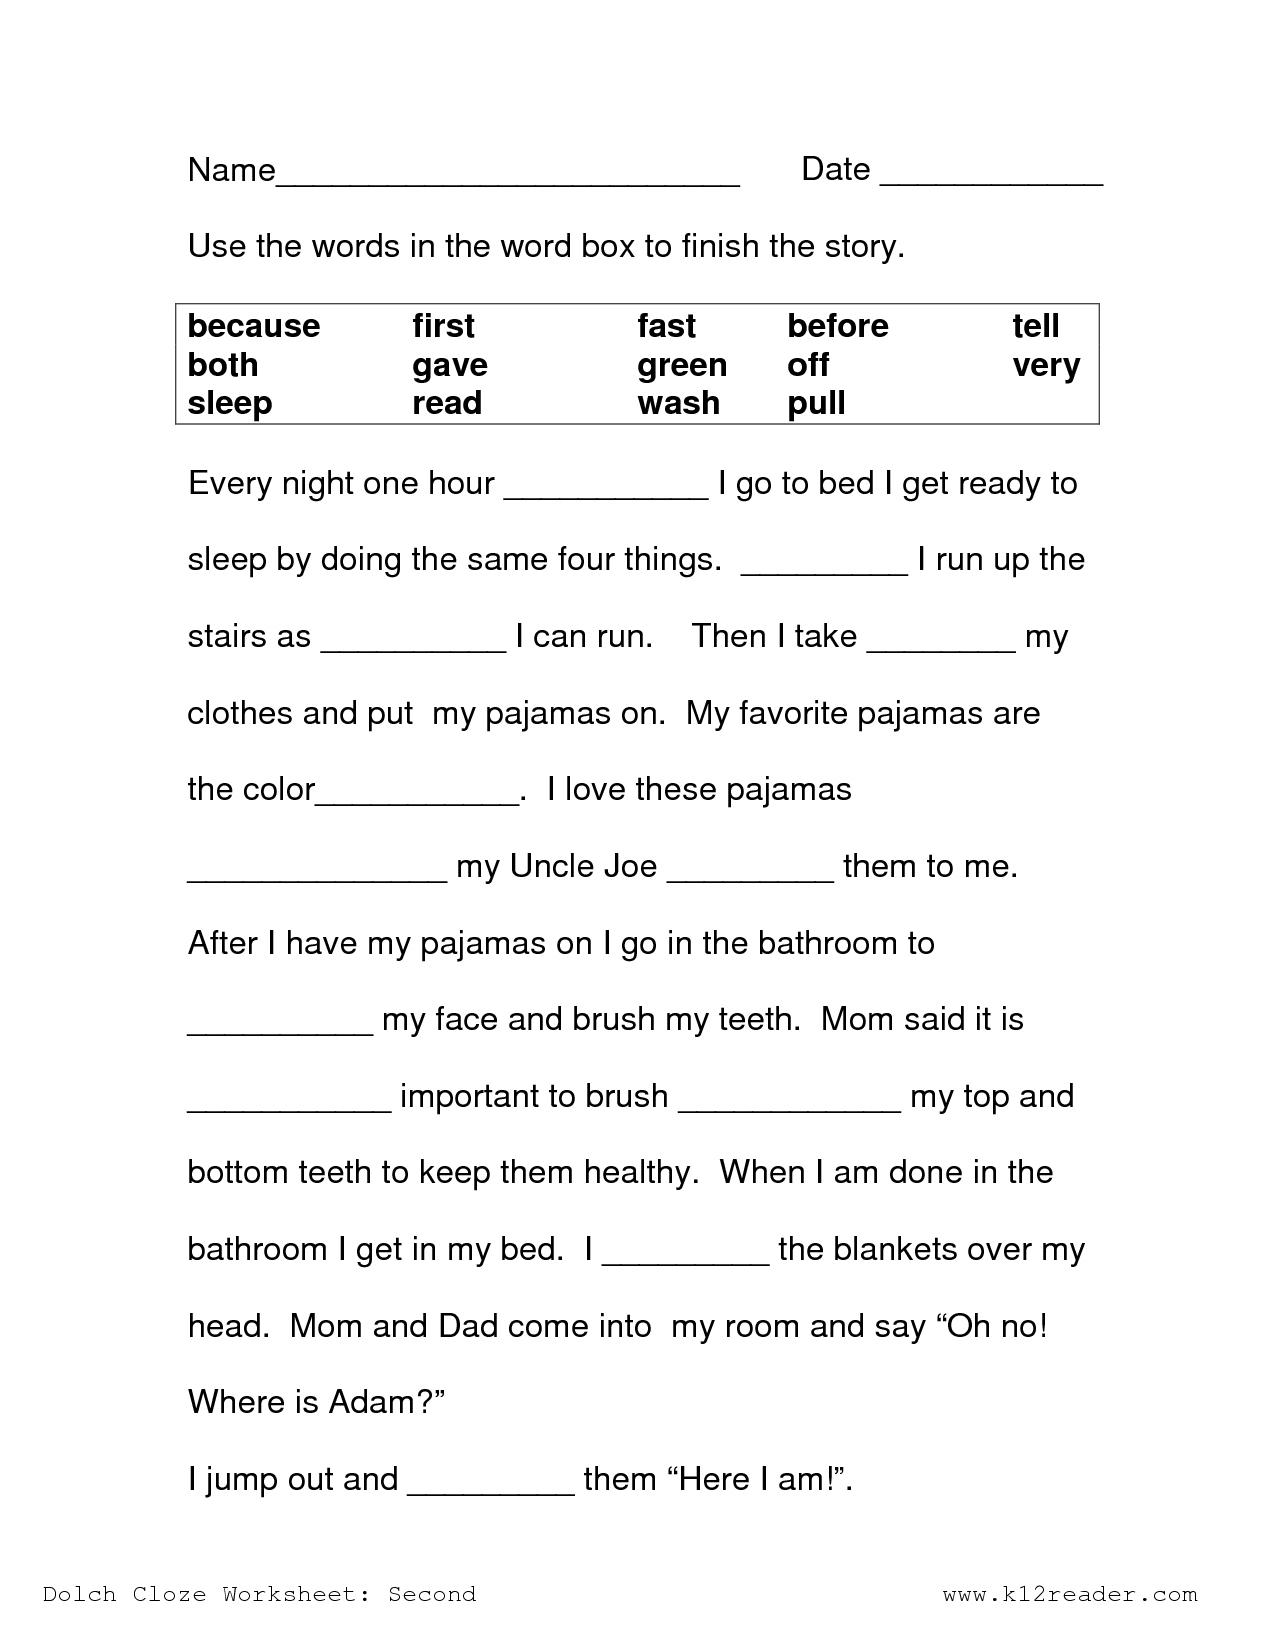 Math Worksheet: 2Nd Grade Science Worksheets Free Printable Easy - Printable Crossword Puzzle For 2Nd Graders